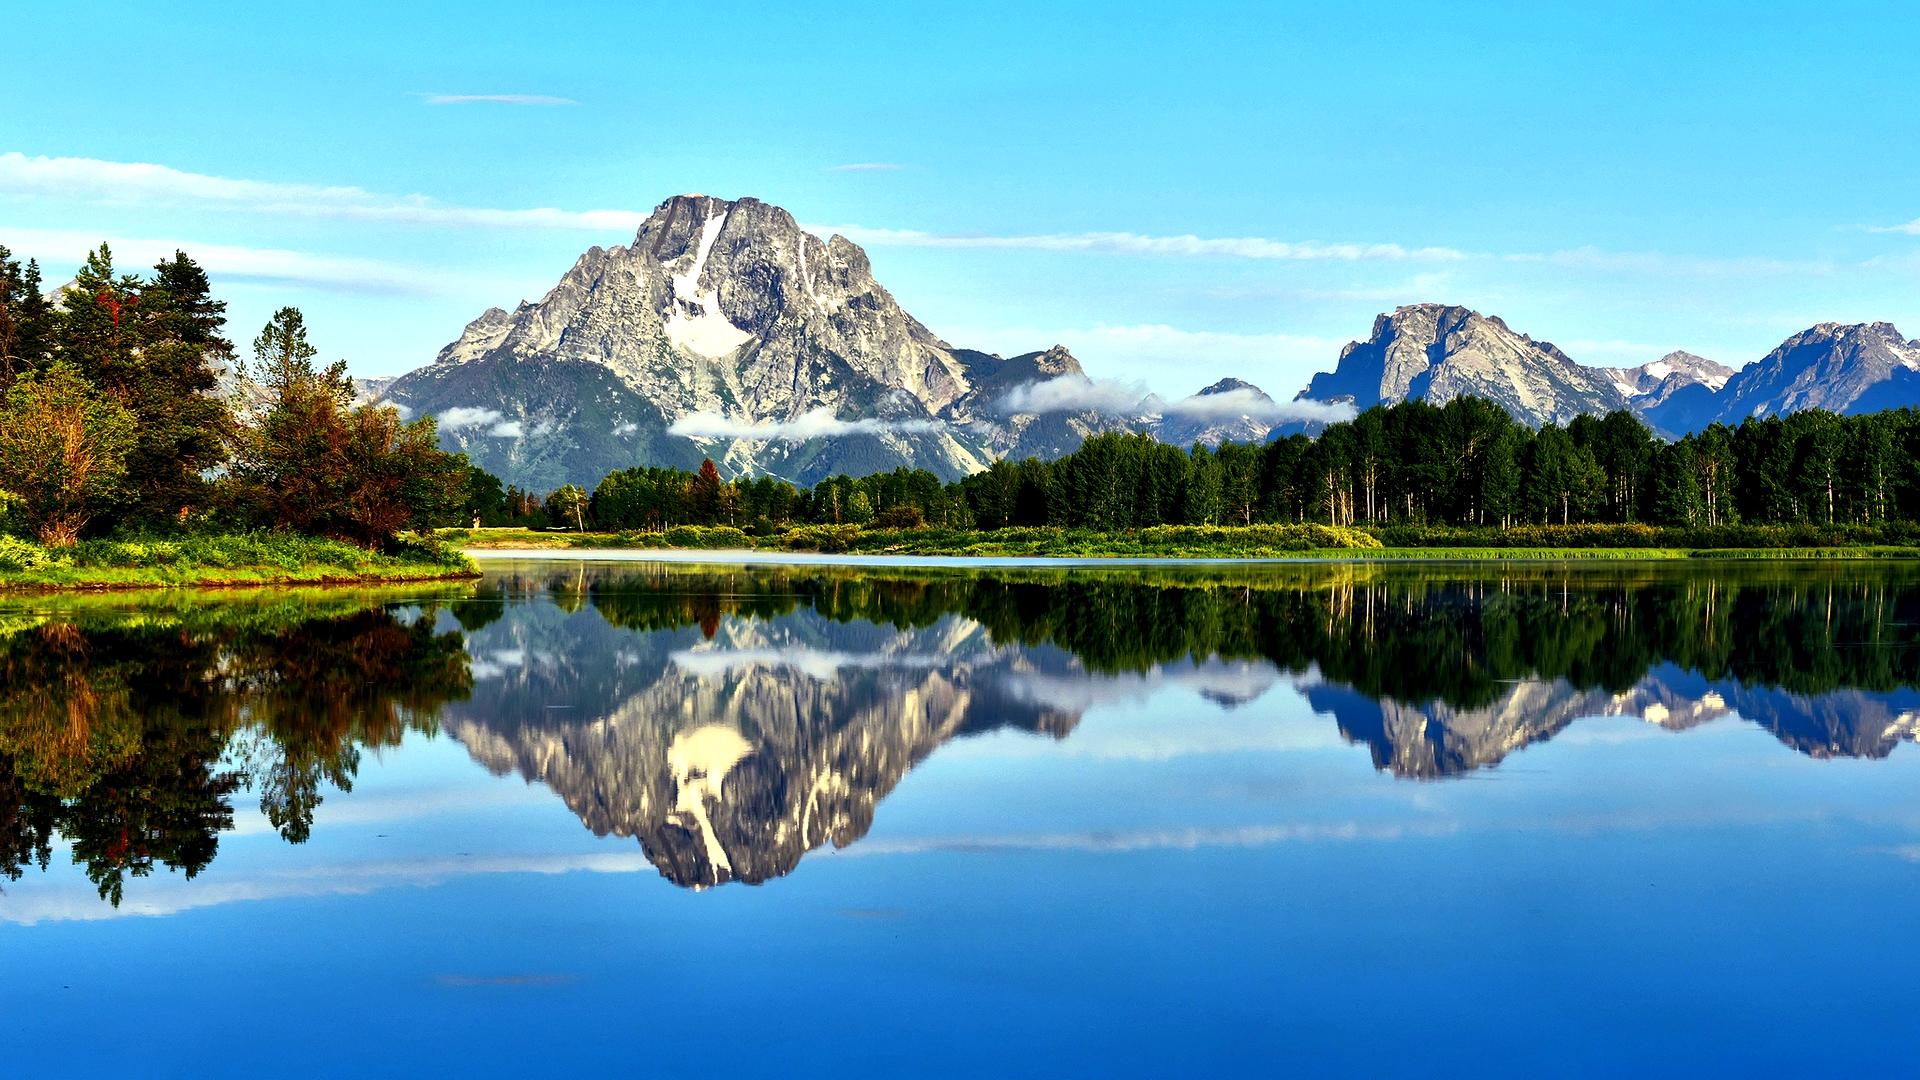 Mountain Lake Scenery